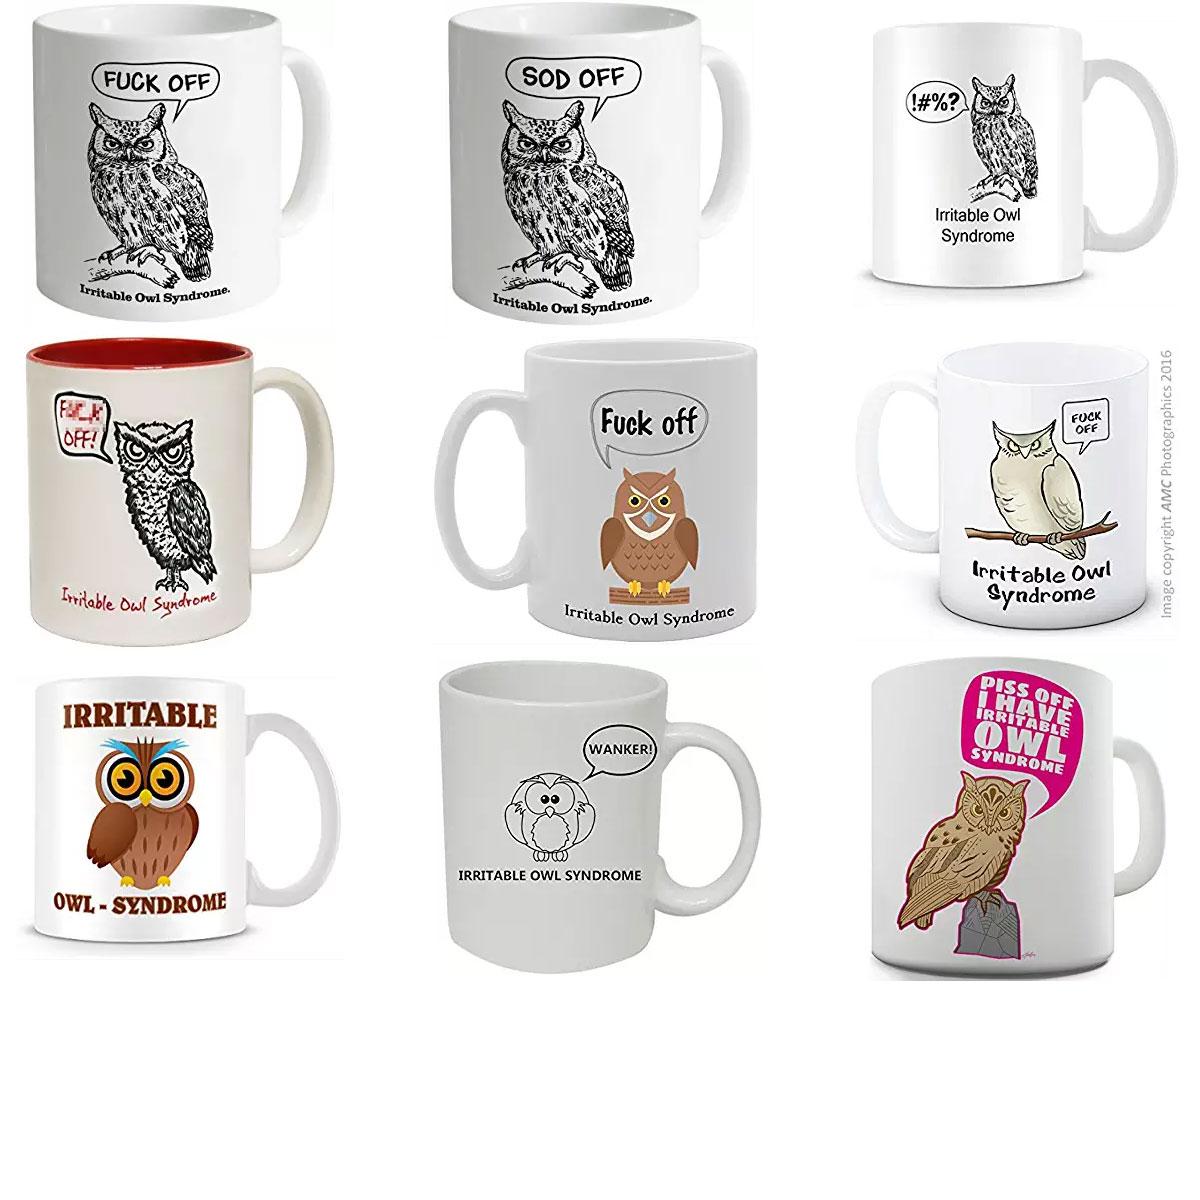 irritable-owl-syndrome-mug